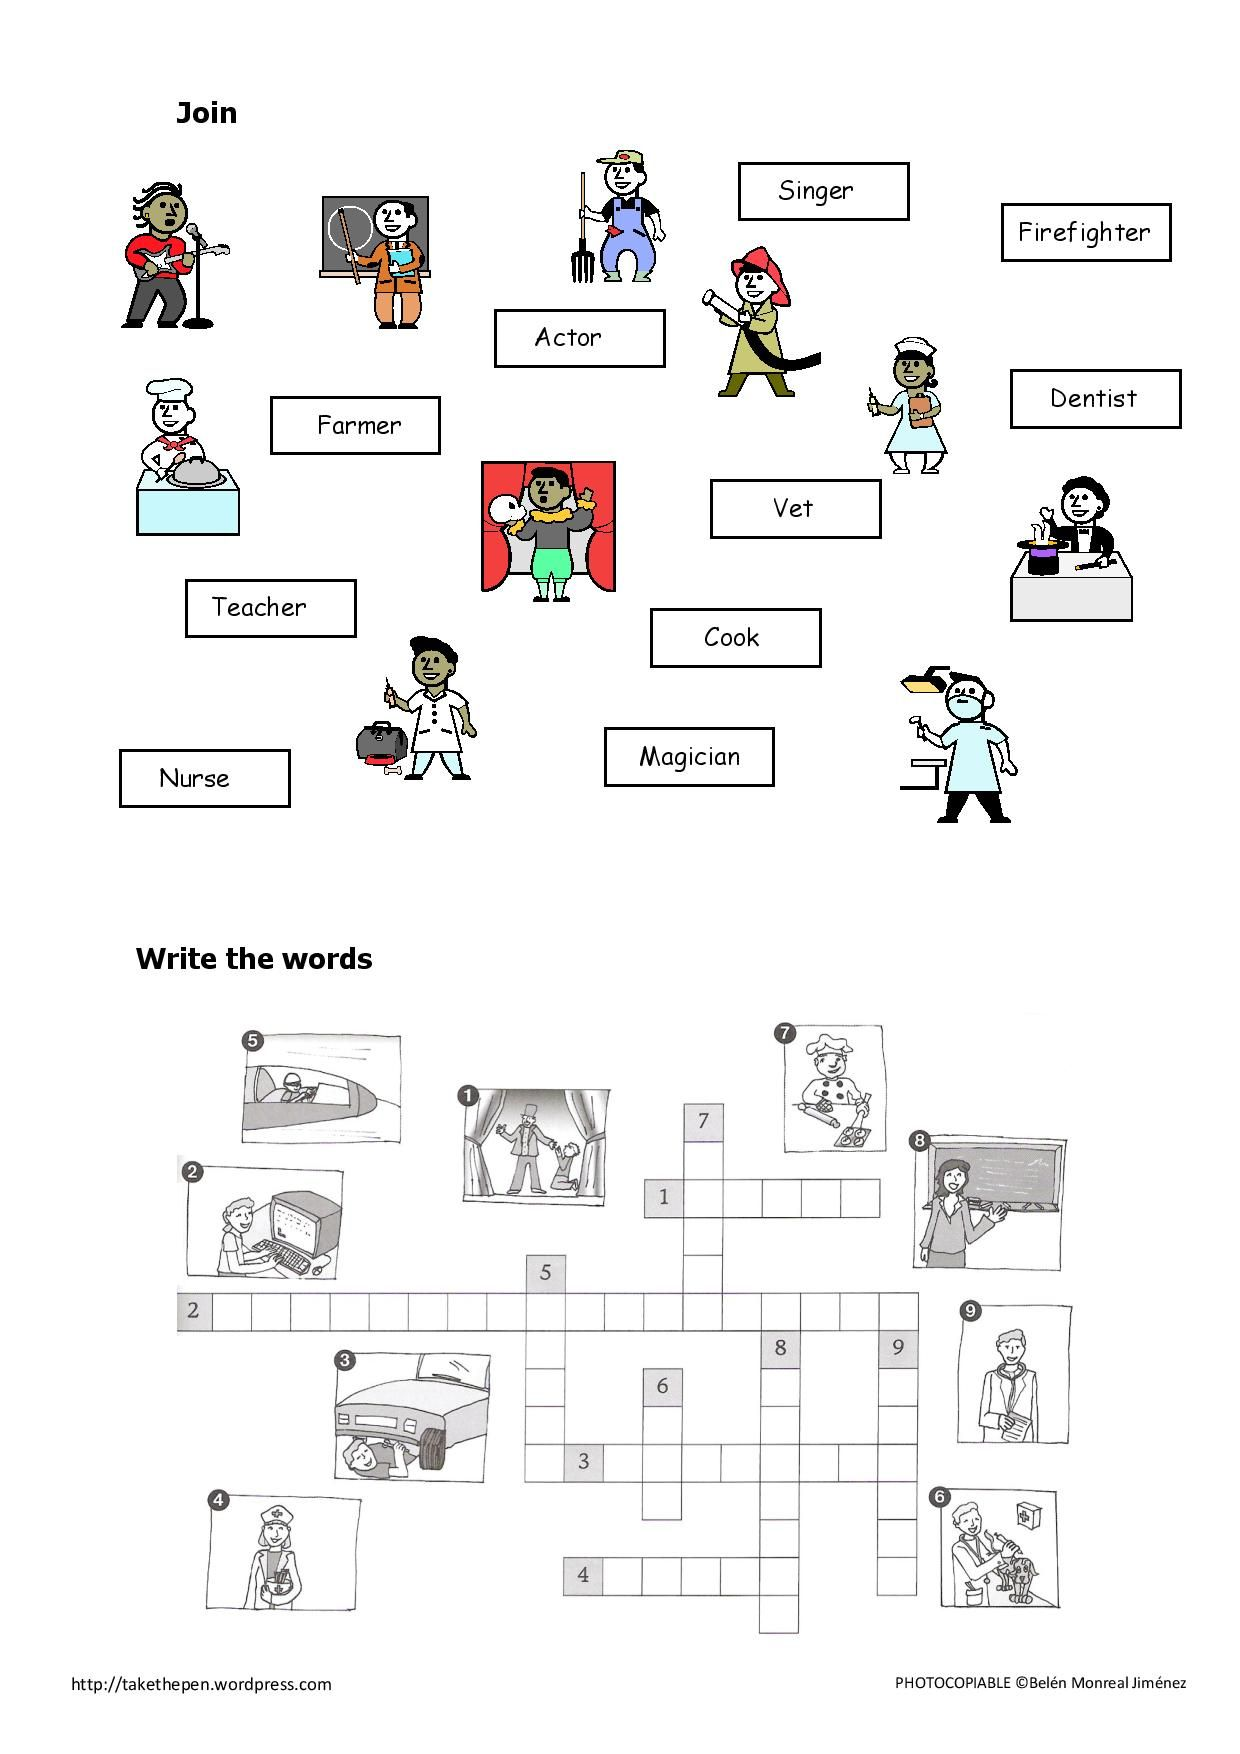 Jobs Crossword Race Writing Vocabulary Vocabulary Worksheets [ 1754 x 1240 Pixel ]